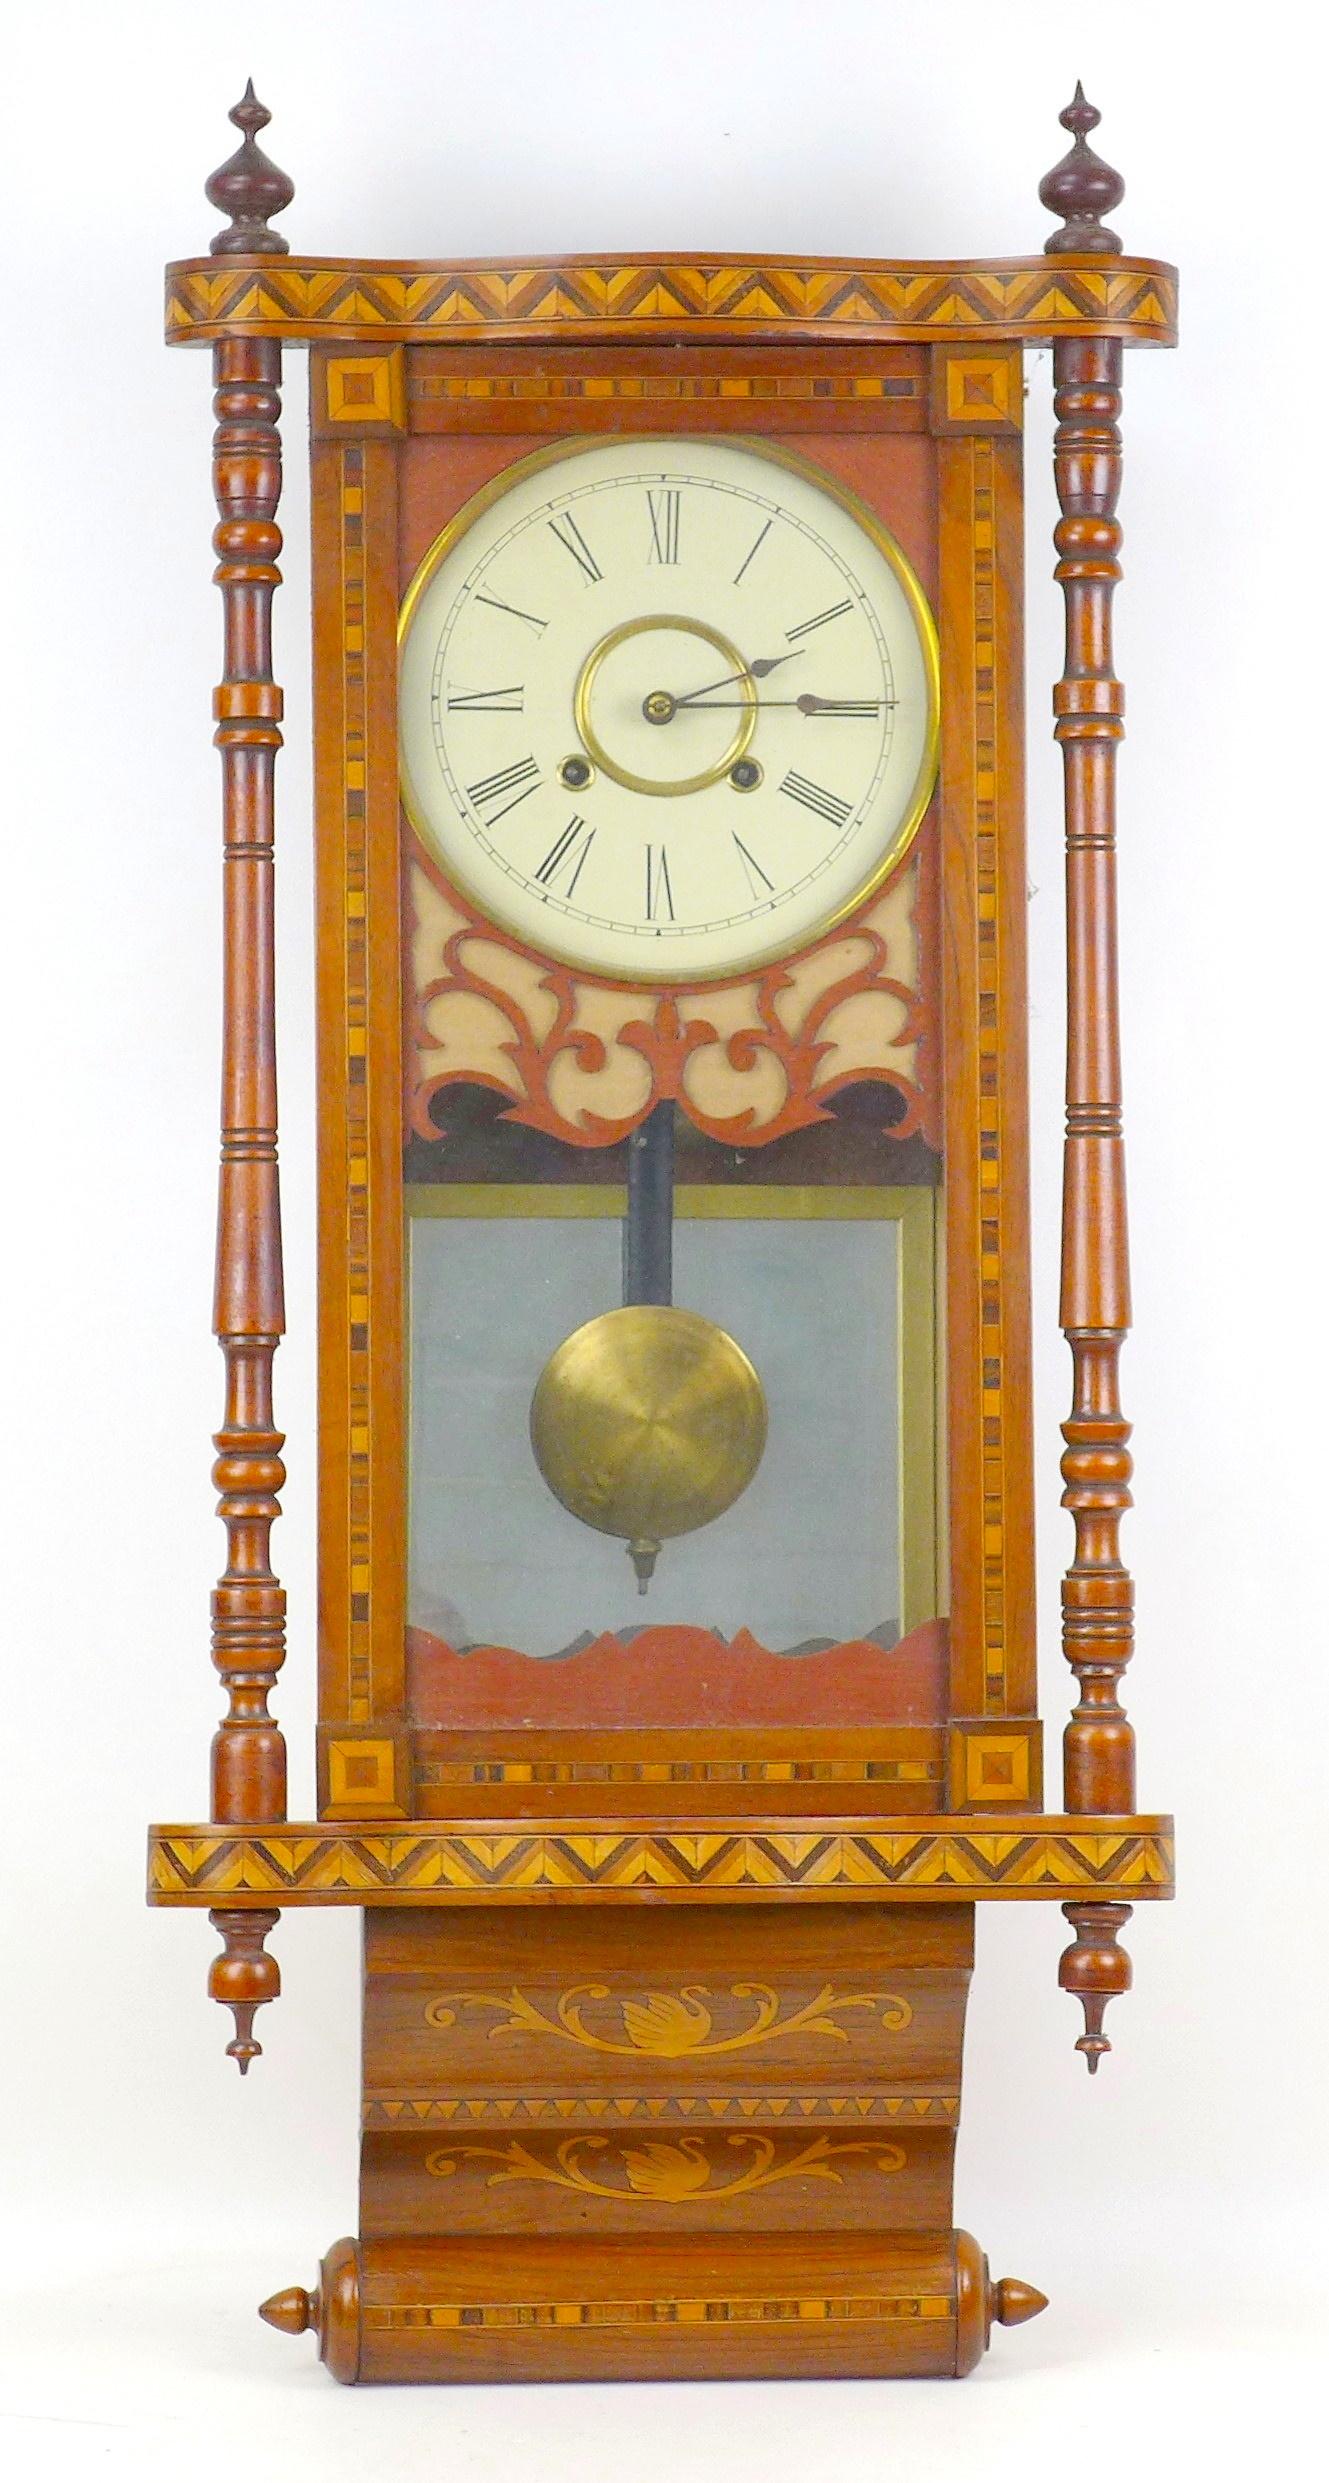 An early 20th century Vienna regulator wall clock with Tunbridge ware inlaid mahogany case, a